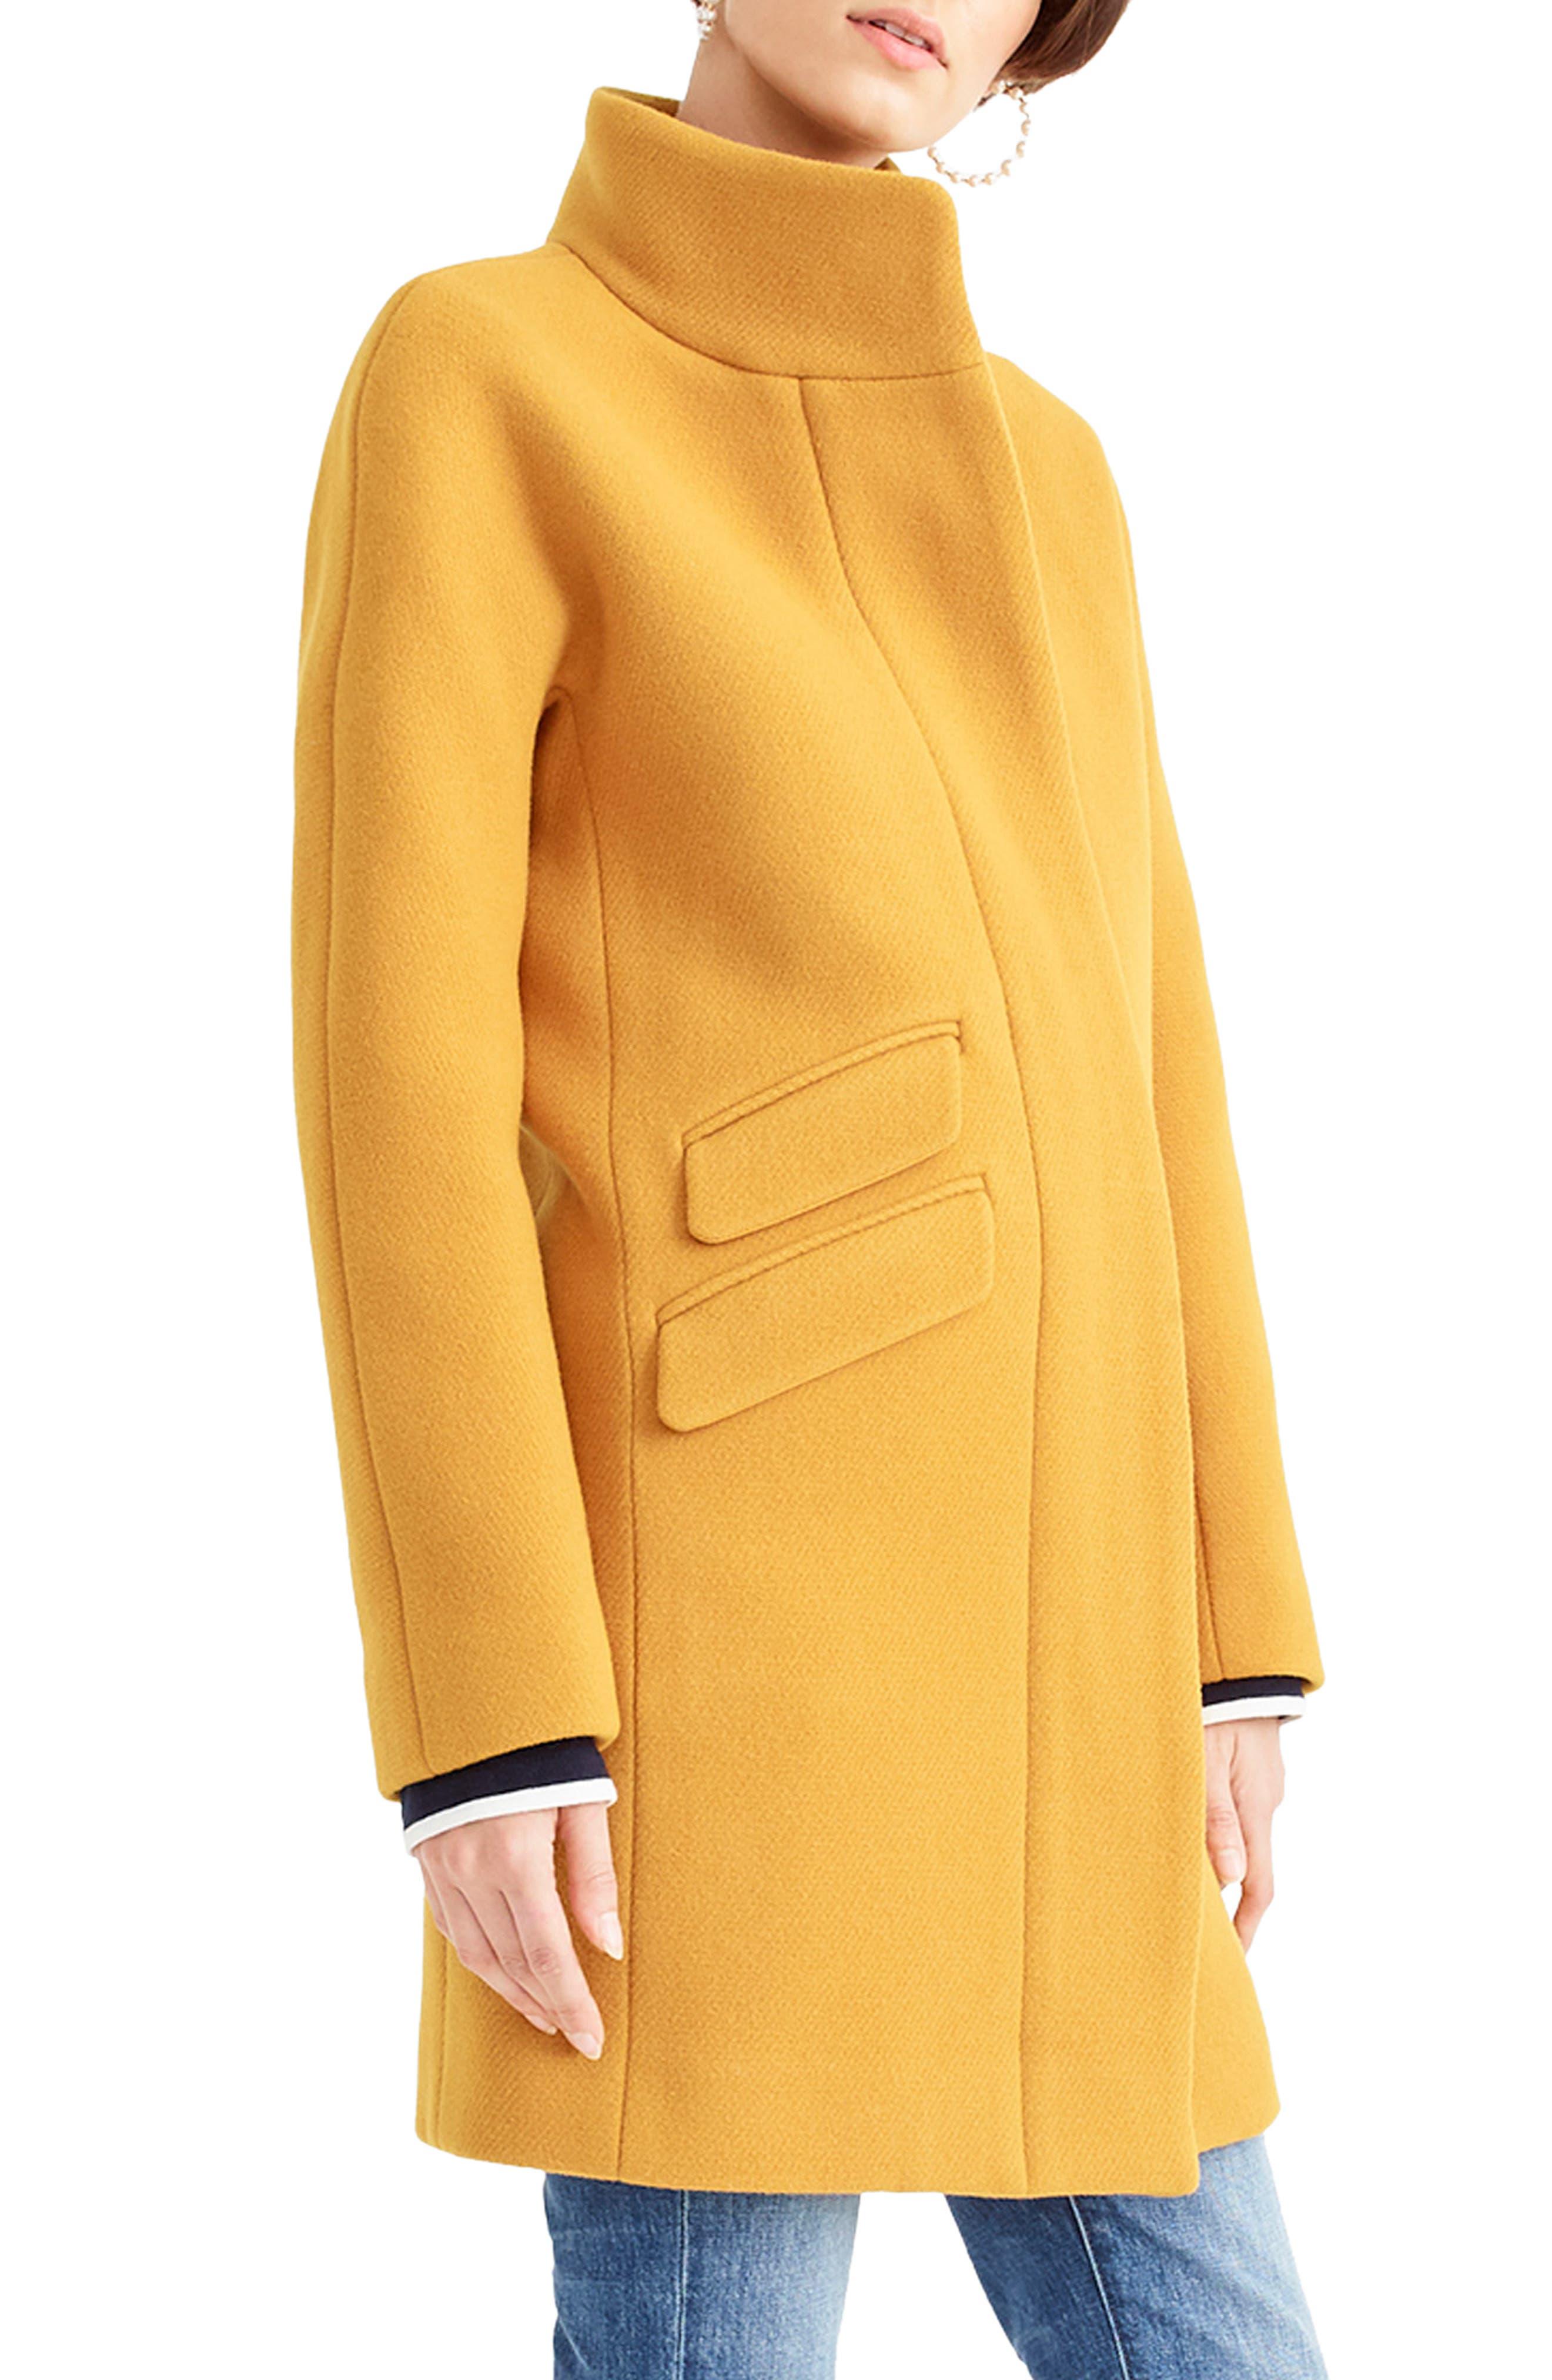 J.CREW, Stadium Cloth Cocoon Coat, Alternate thumbnail 4, color, 800